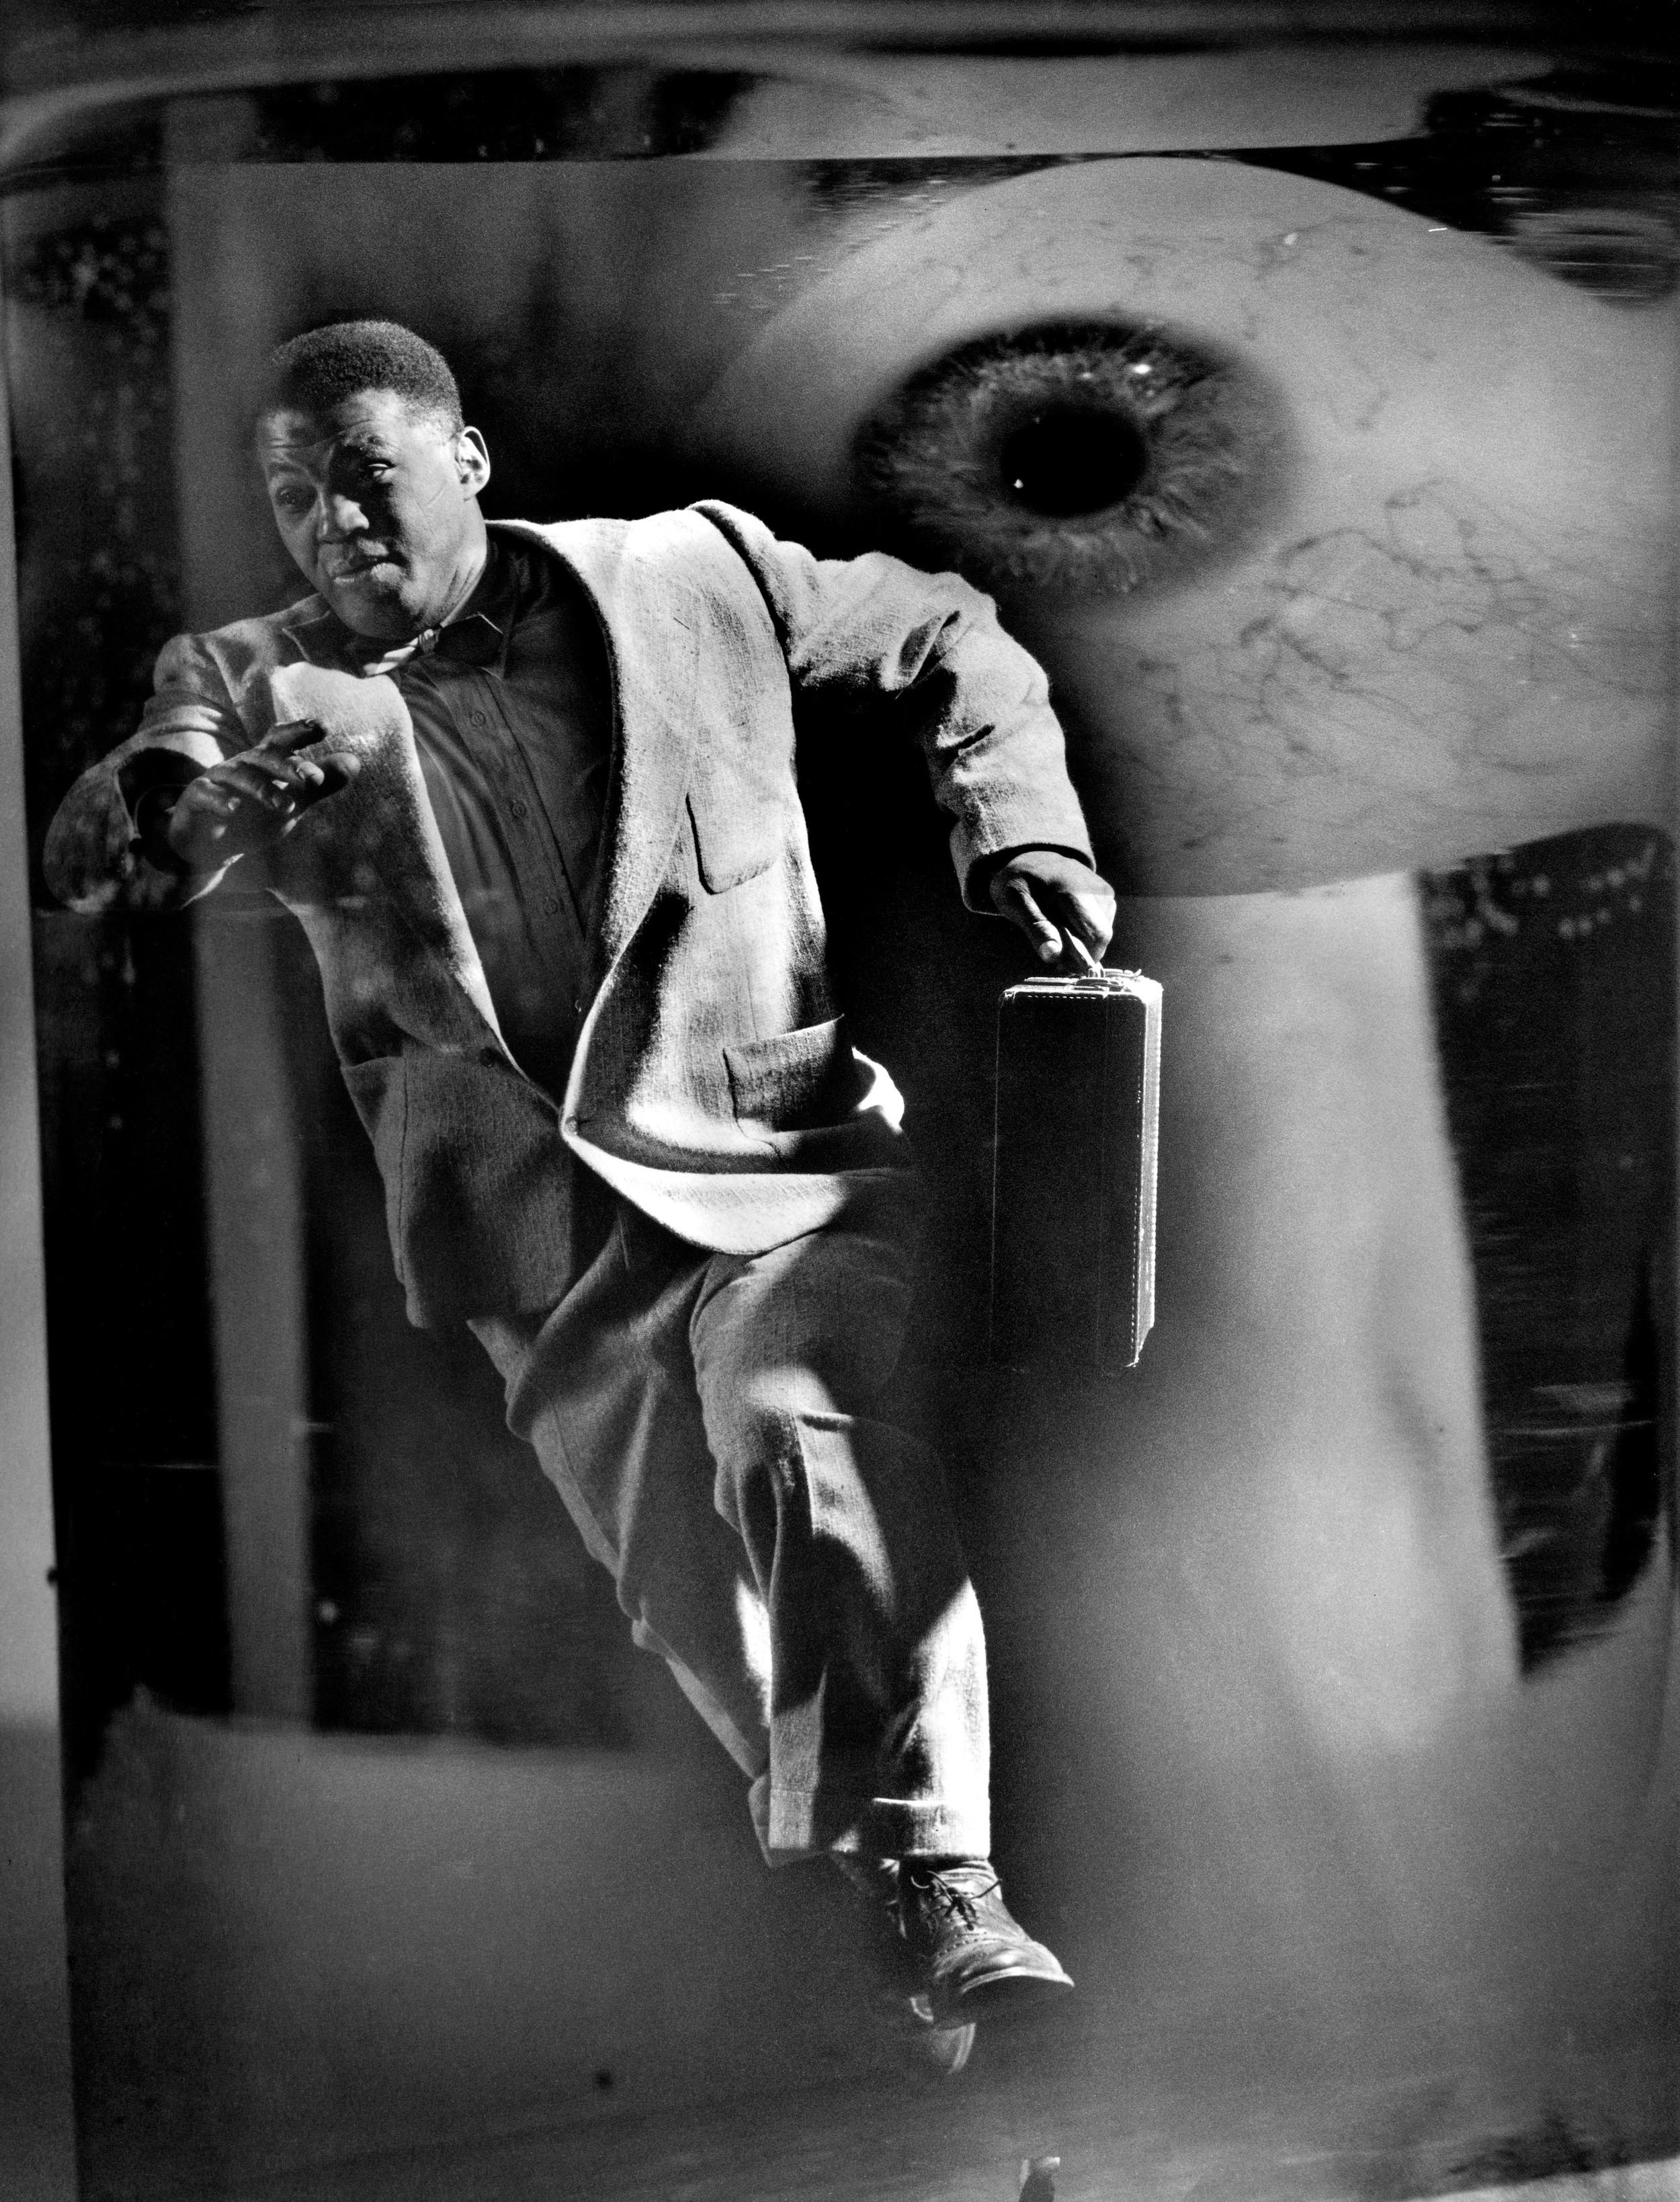 Image Above: ©The Gordon Parks Foundation. Gordon Parks, Untitled, Harlem, New York, 1952 / Courtesy of The Gordon Parks Foundation/The Art Institute of Chicago/Steidl